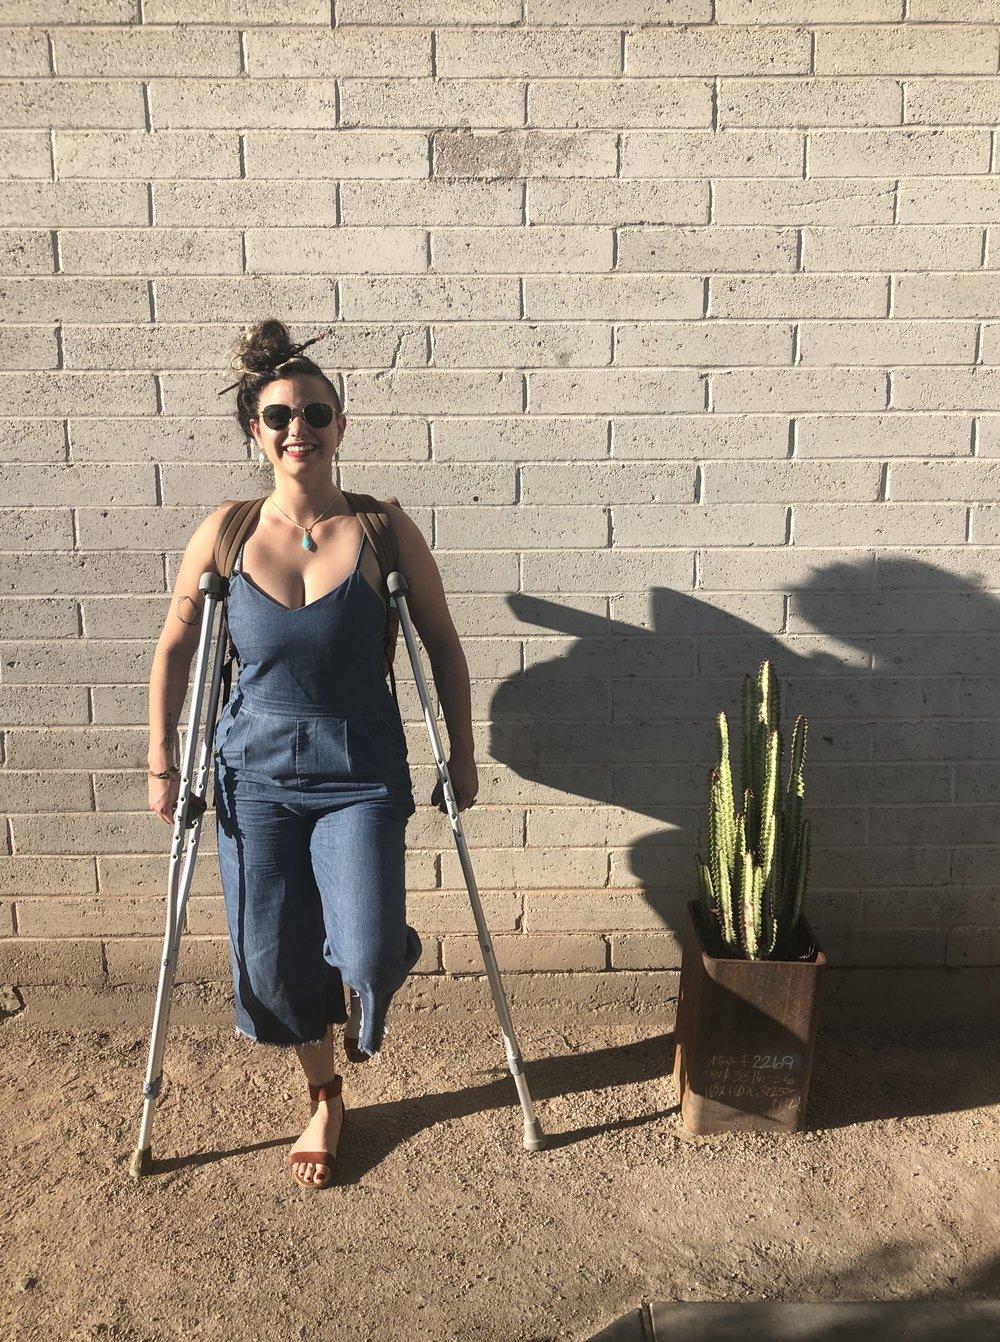 Photo by Charity Yoro, Lux Central, Phoenix, AZ 2018